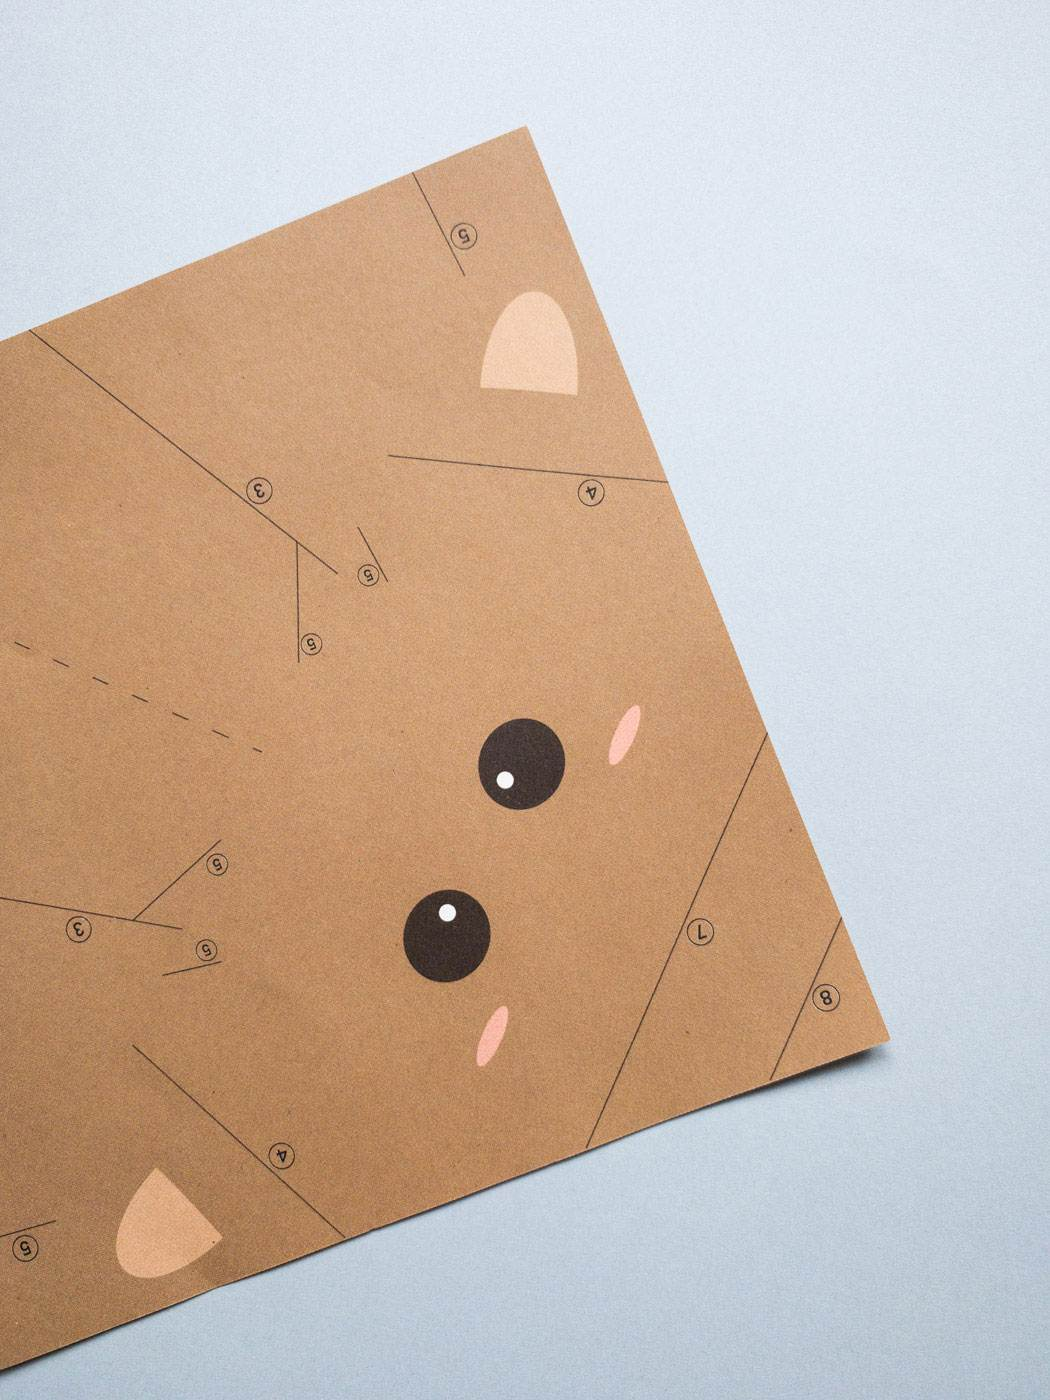 agence-bad-kitty-papier-origami-5